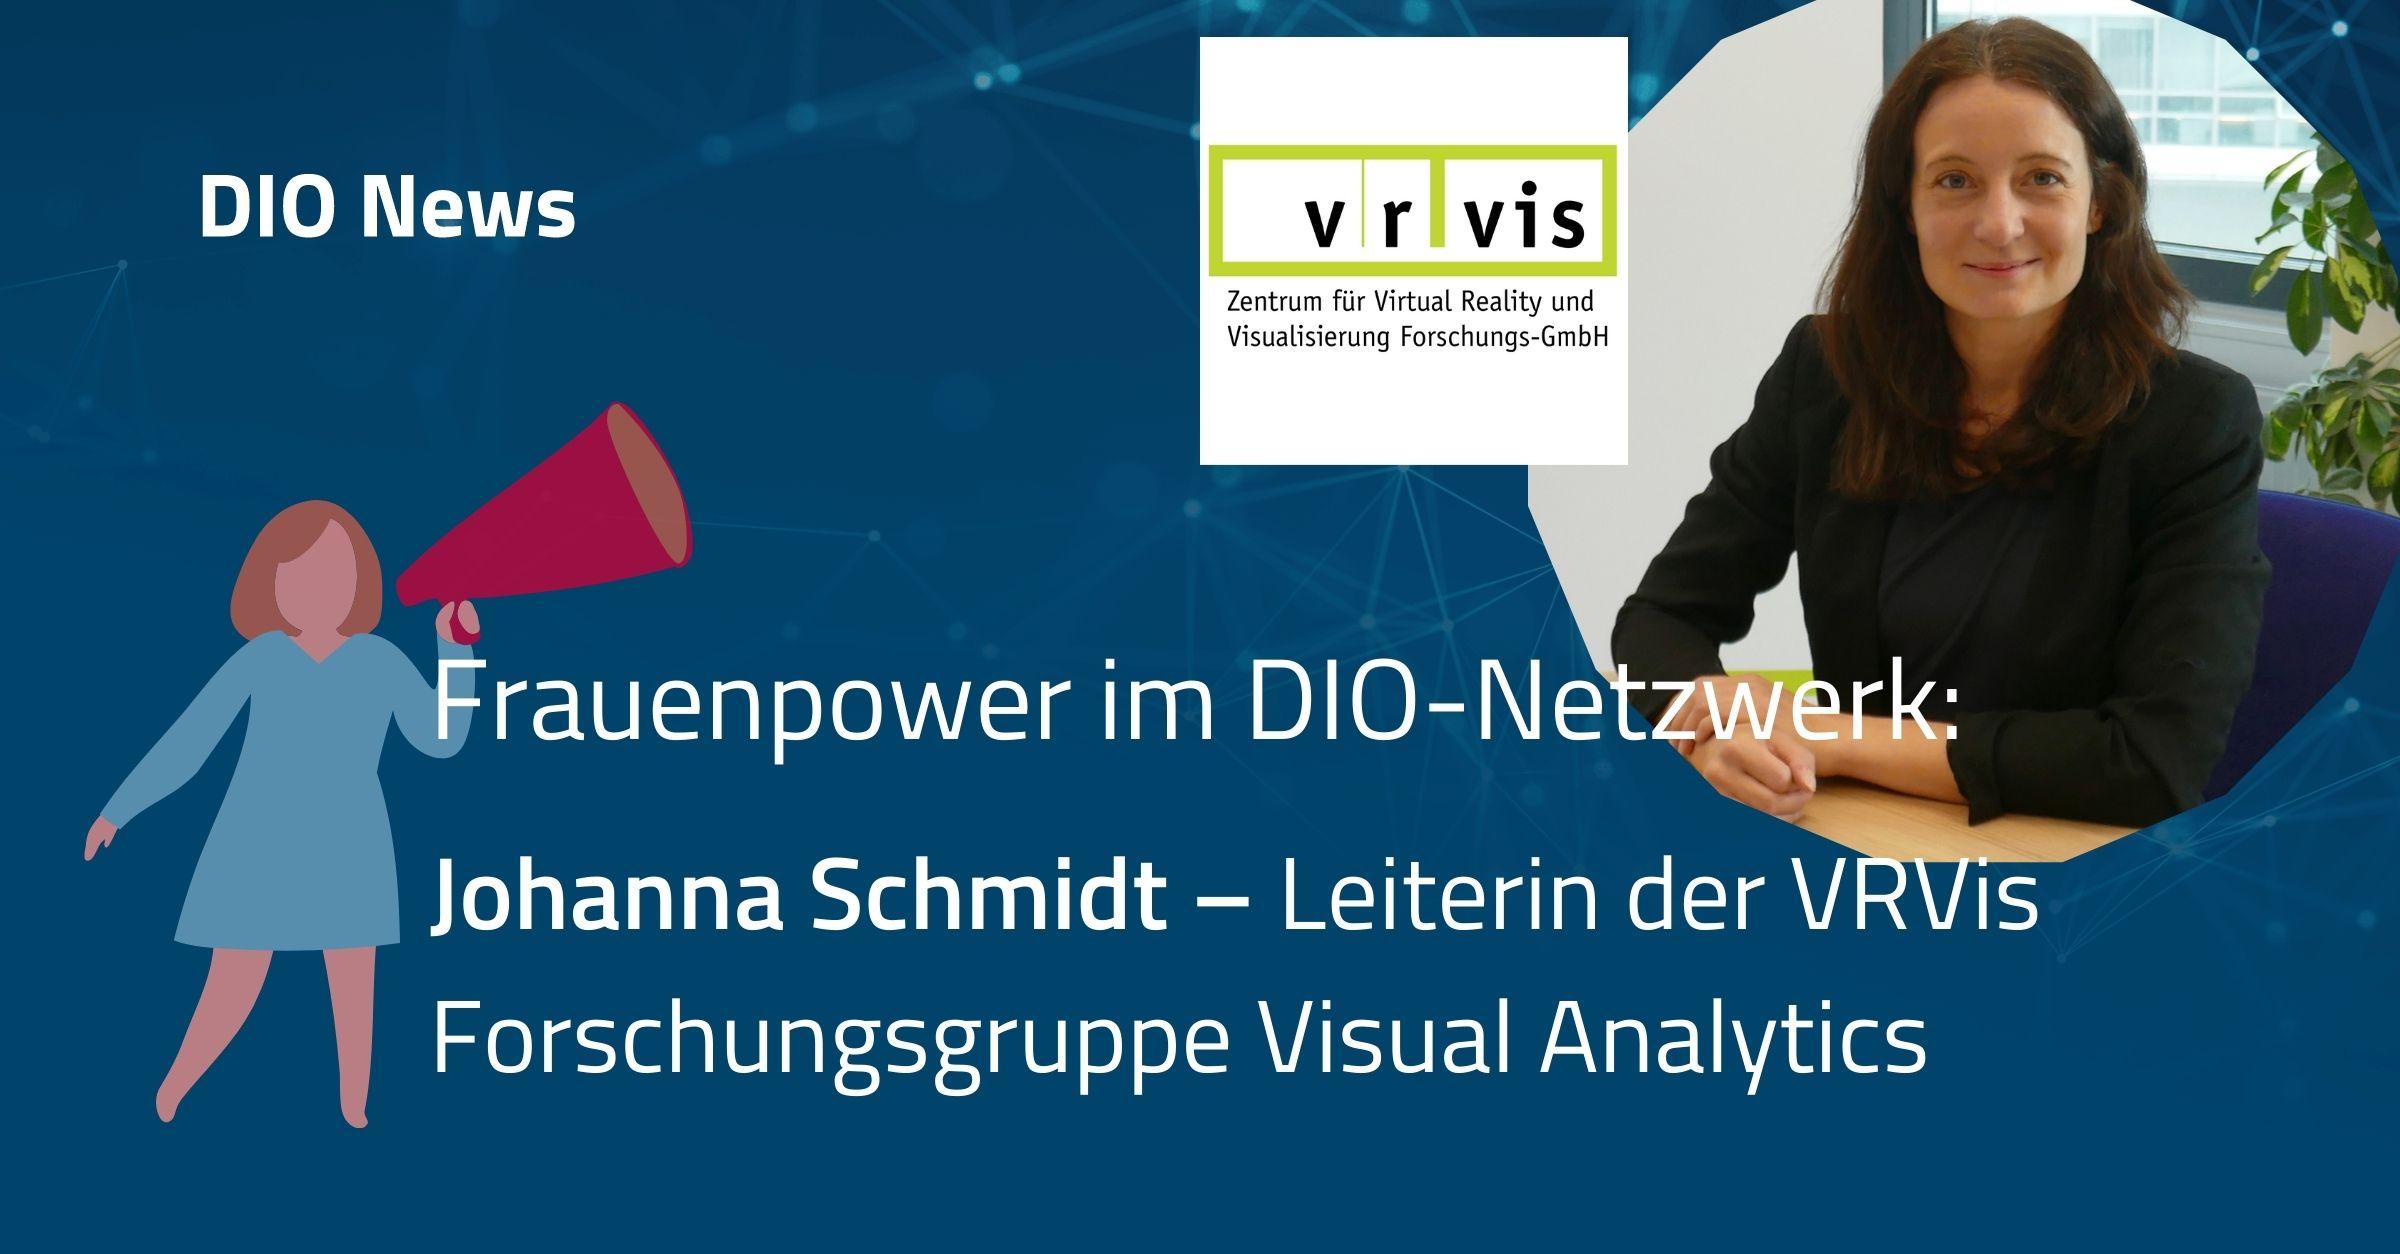 Frauenpower im DIO-Netzwerk: Johannah Schmidt – Leiterin der VRVis Forschungsgruppe Visual Analytics